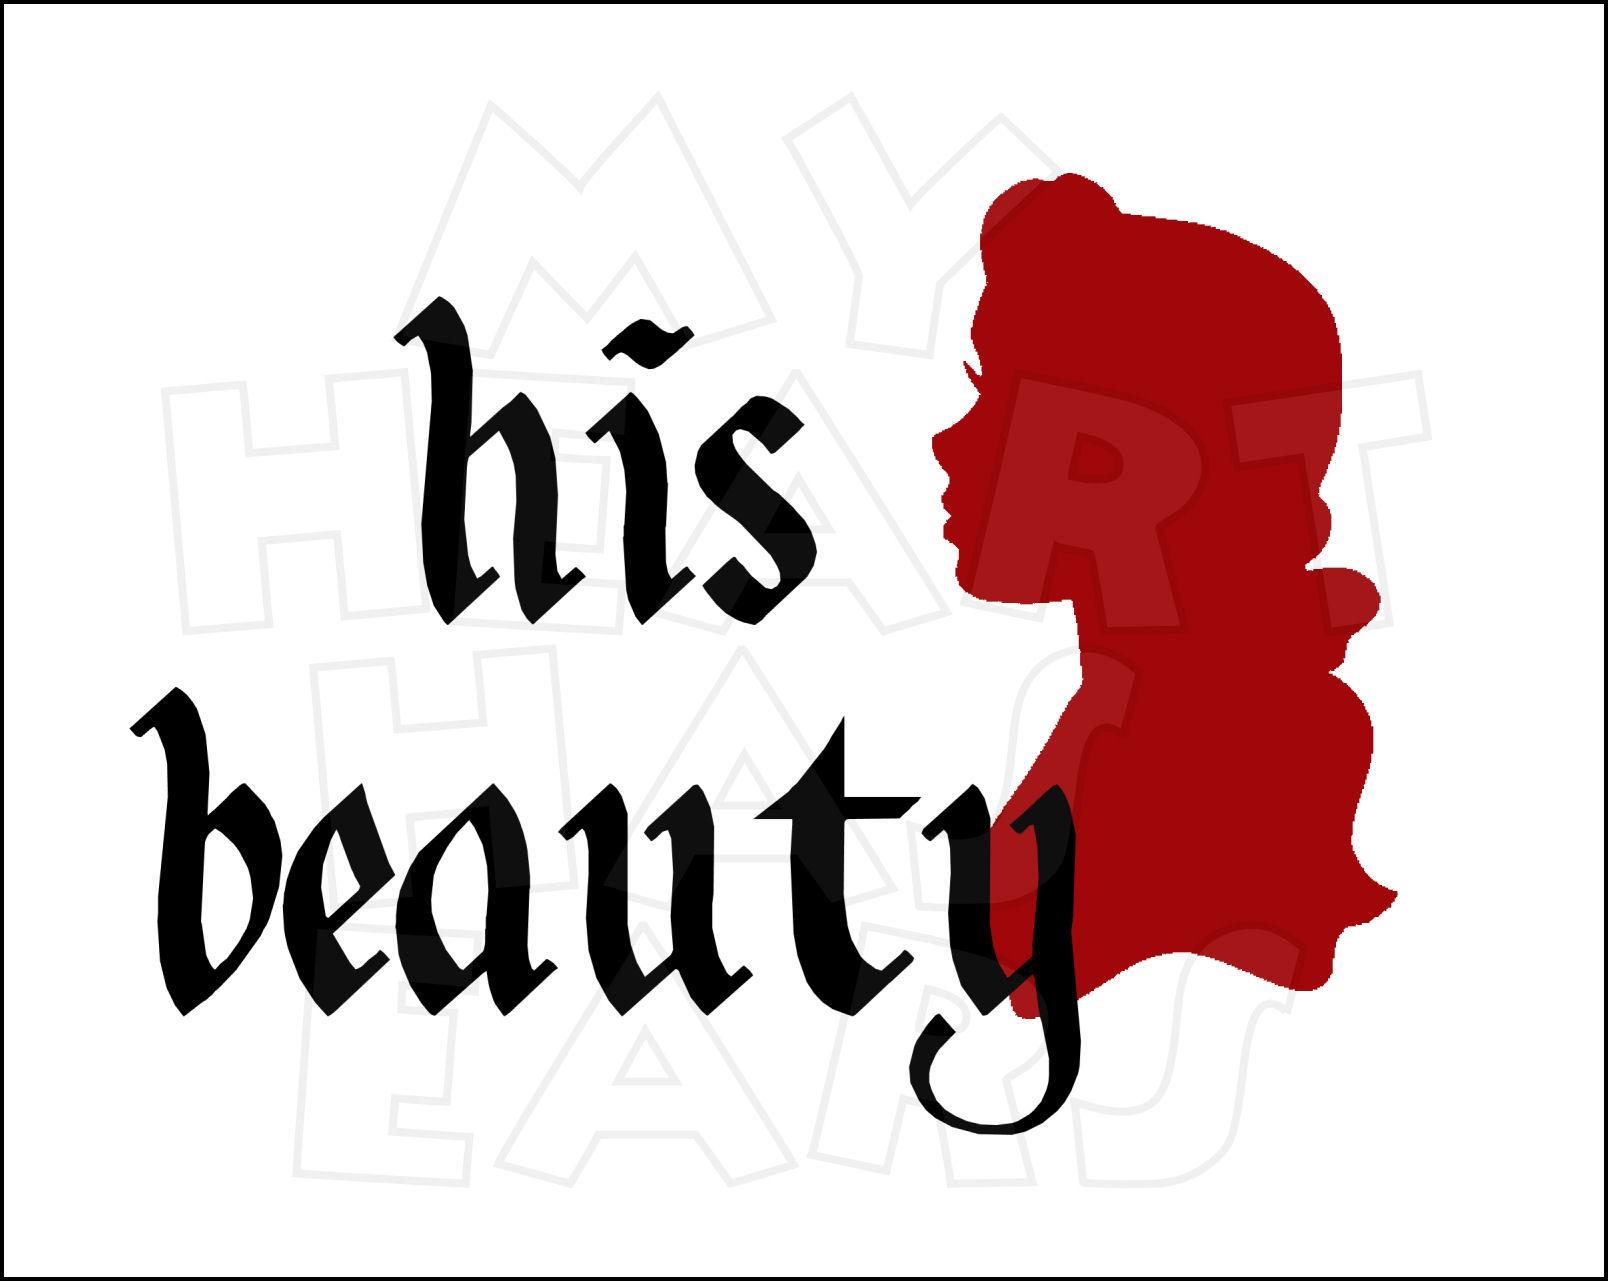 1608x1281 Clip Art Beauty And The Beast Clip Art